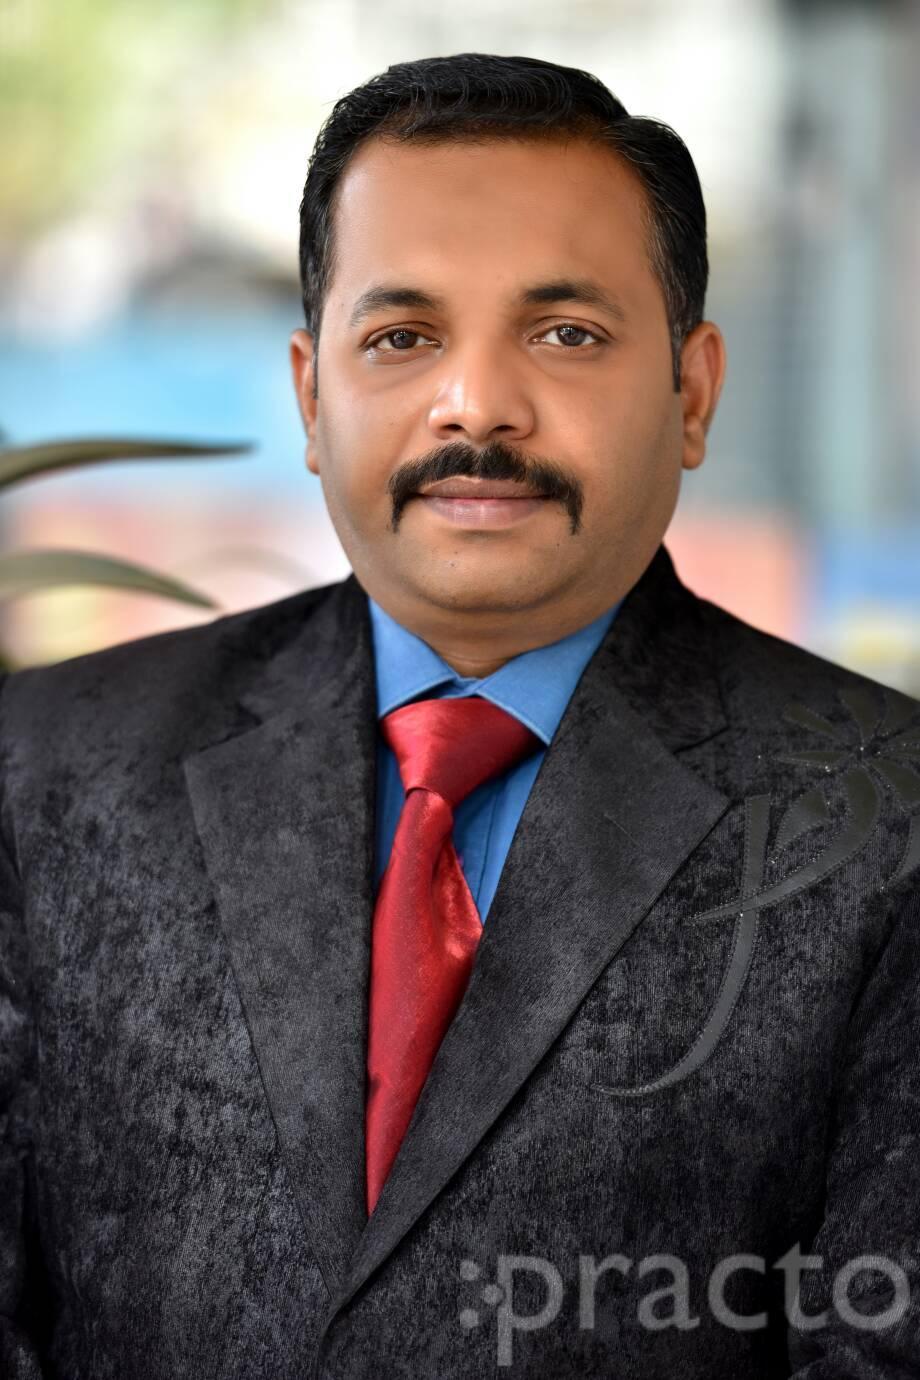 Dr. Amjad Khan - Homeopath